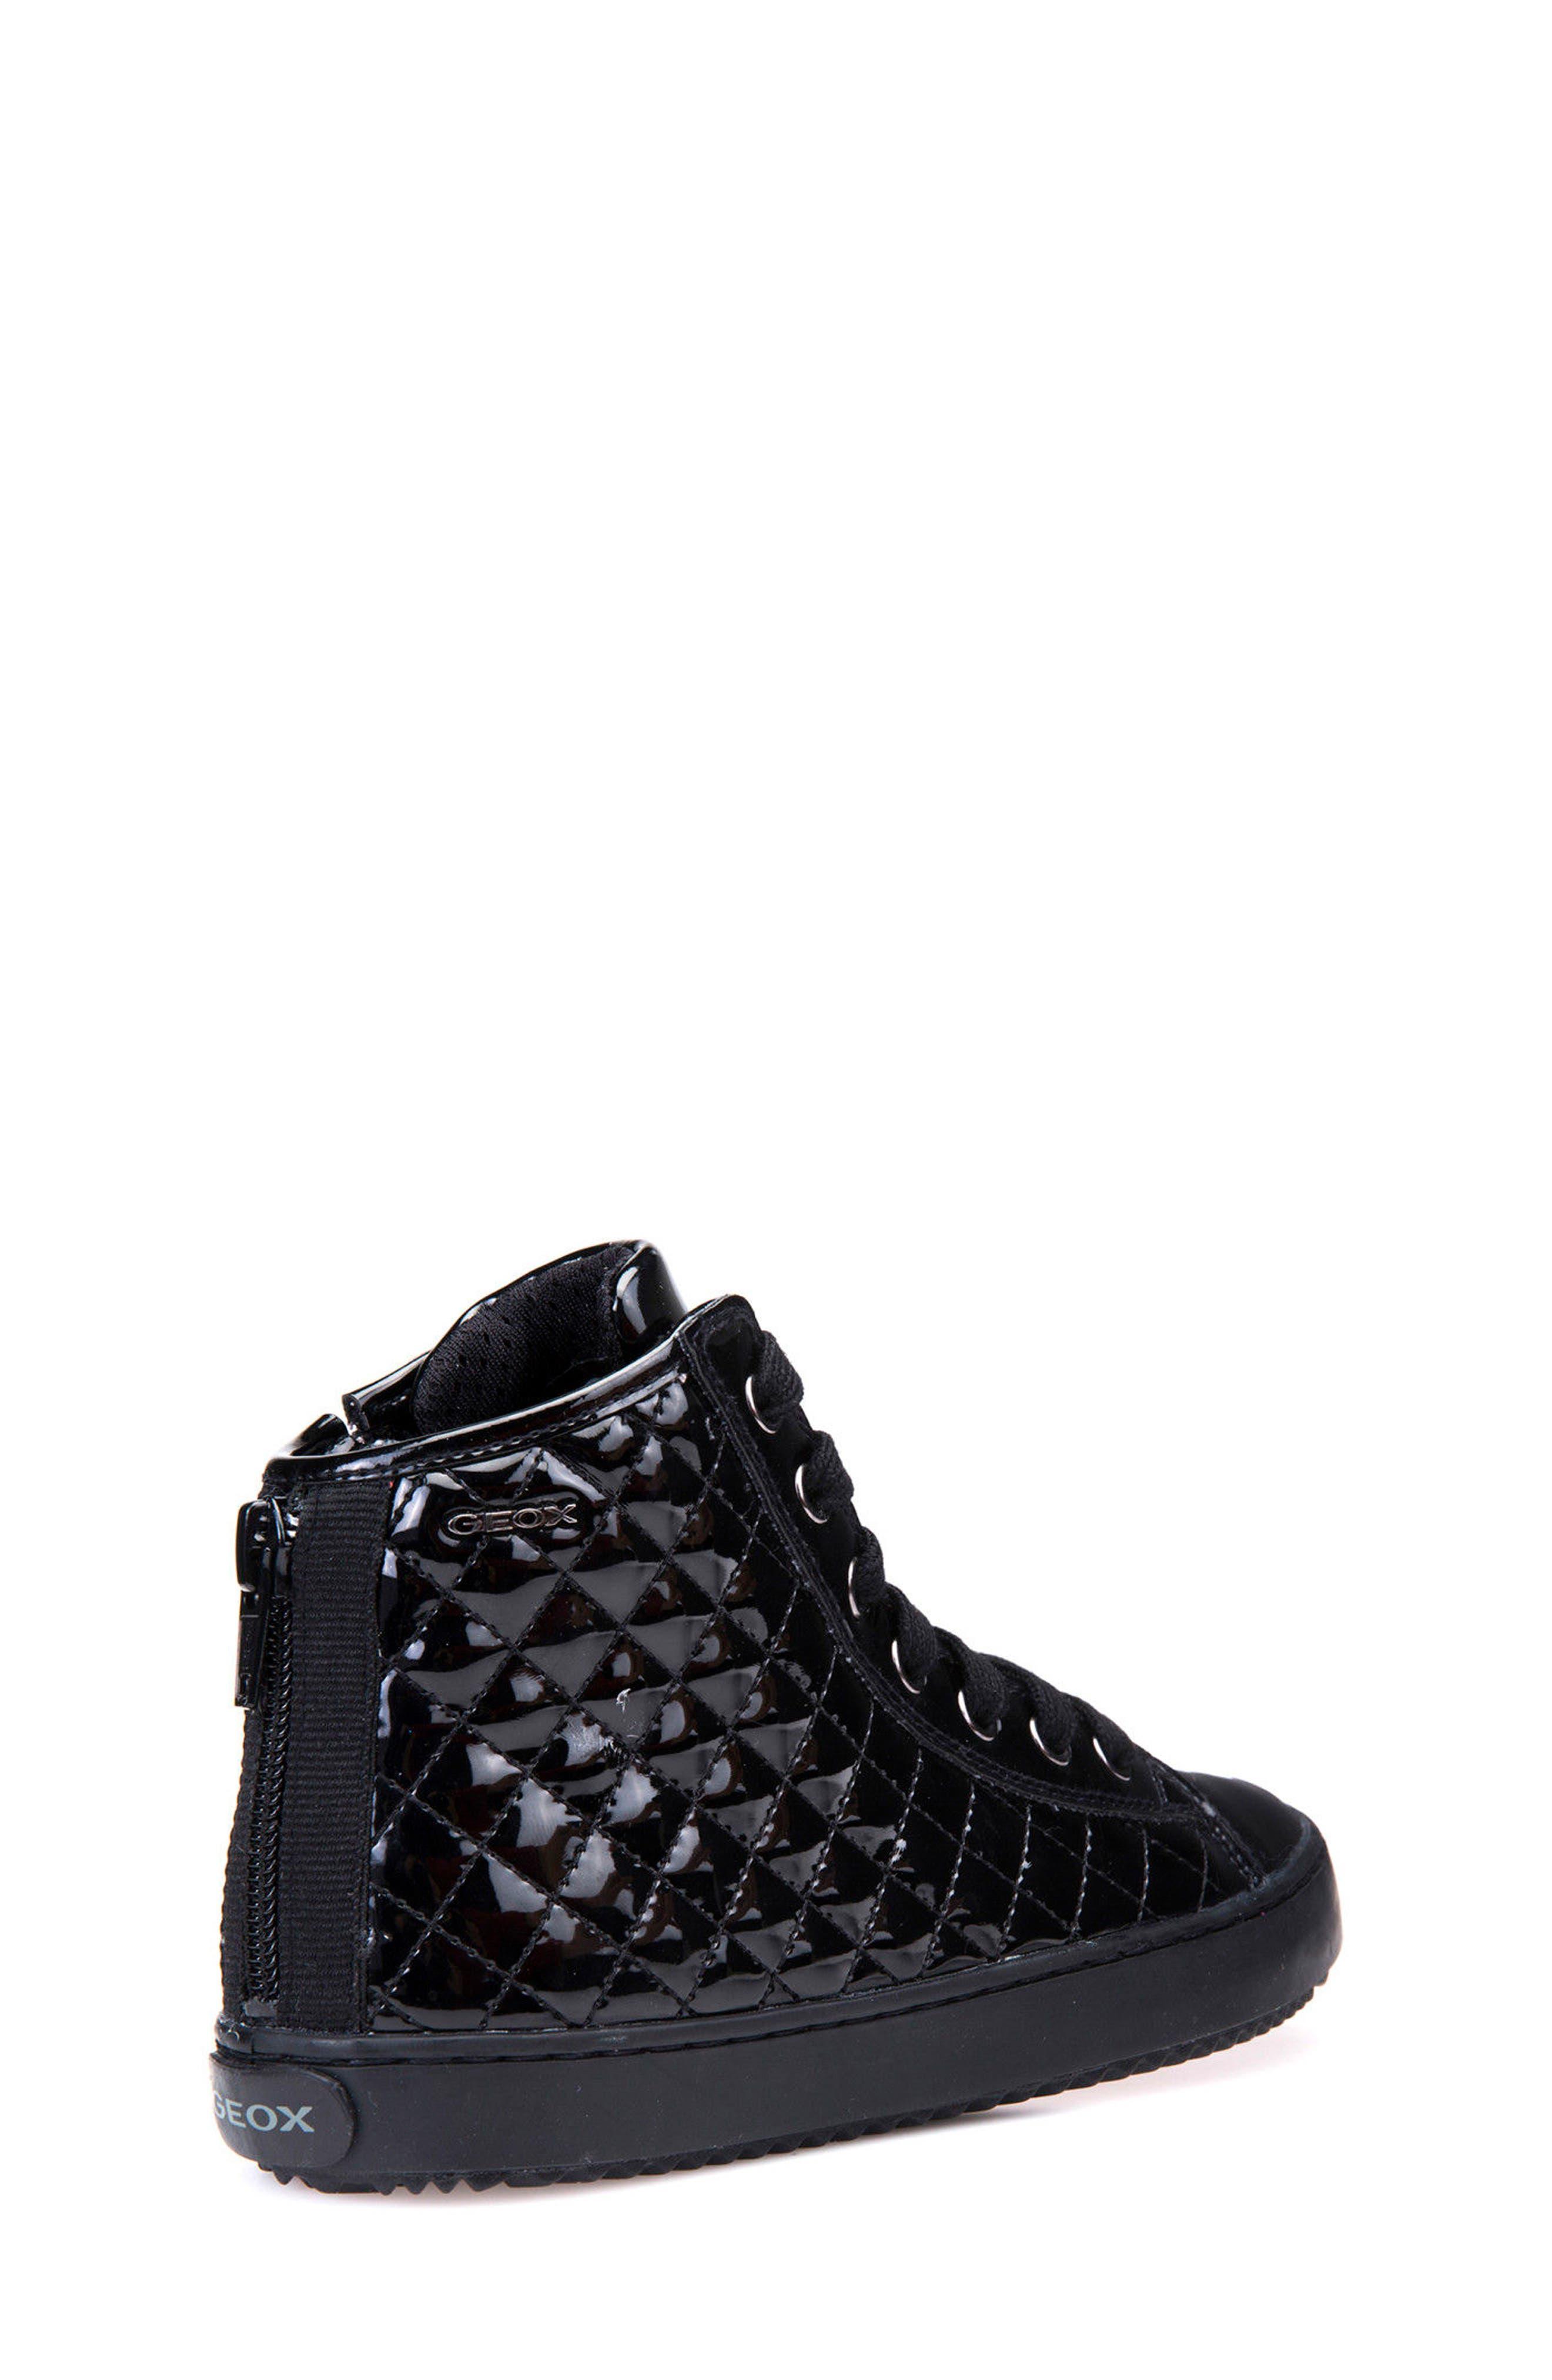 Kalispera Girl Quilted High-Top Sneaker,                             Alternate thumbnail 7, color,                             Black